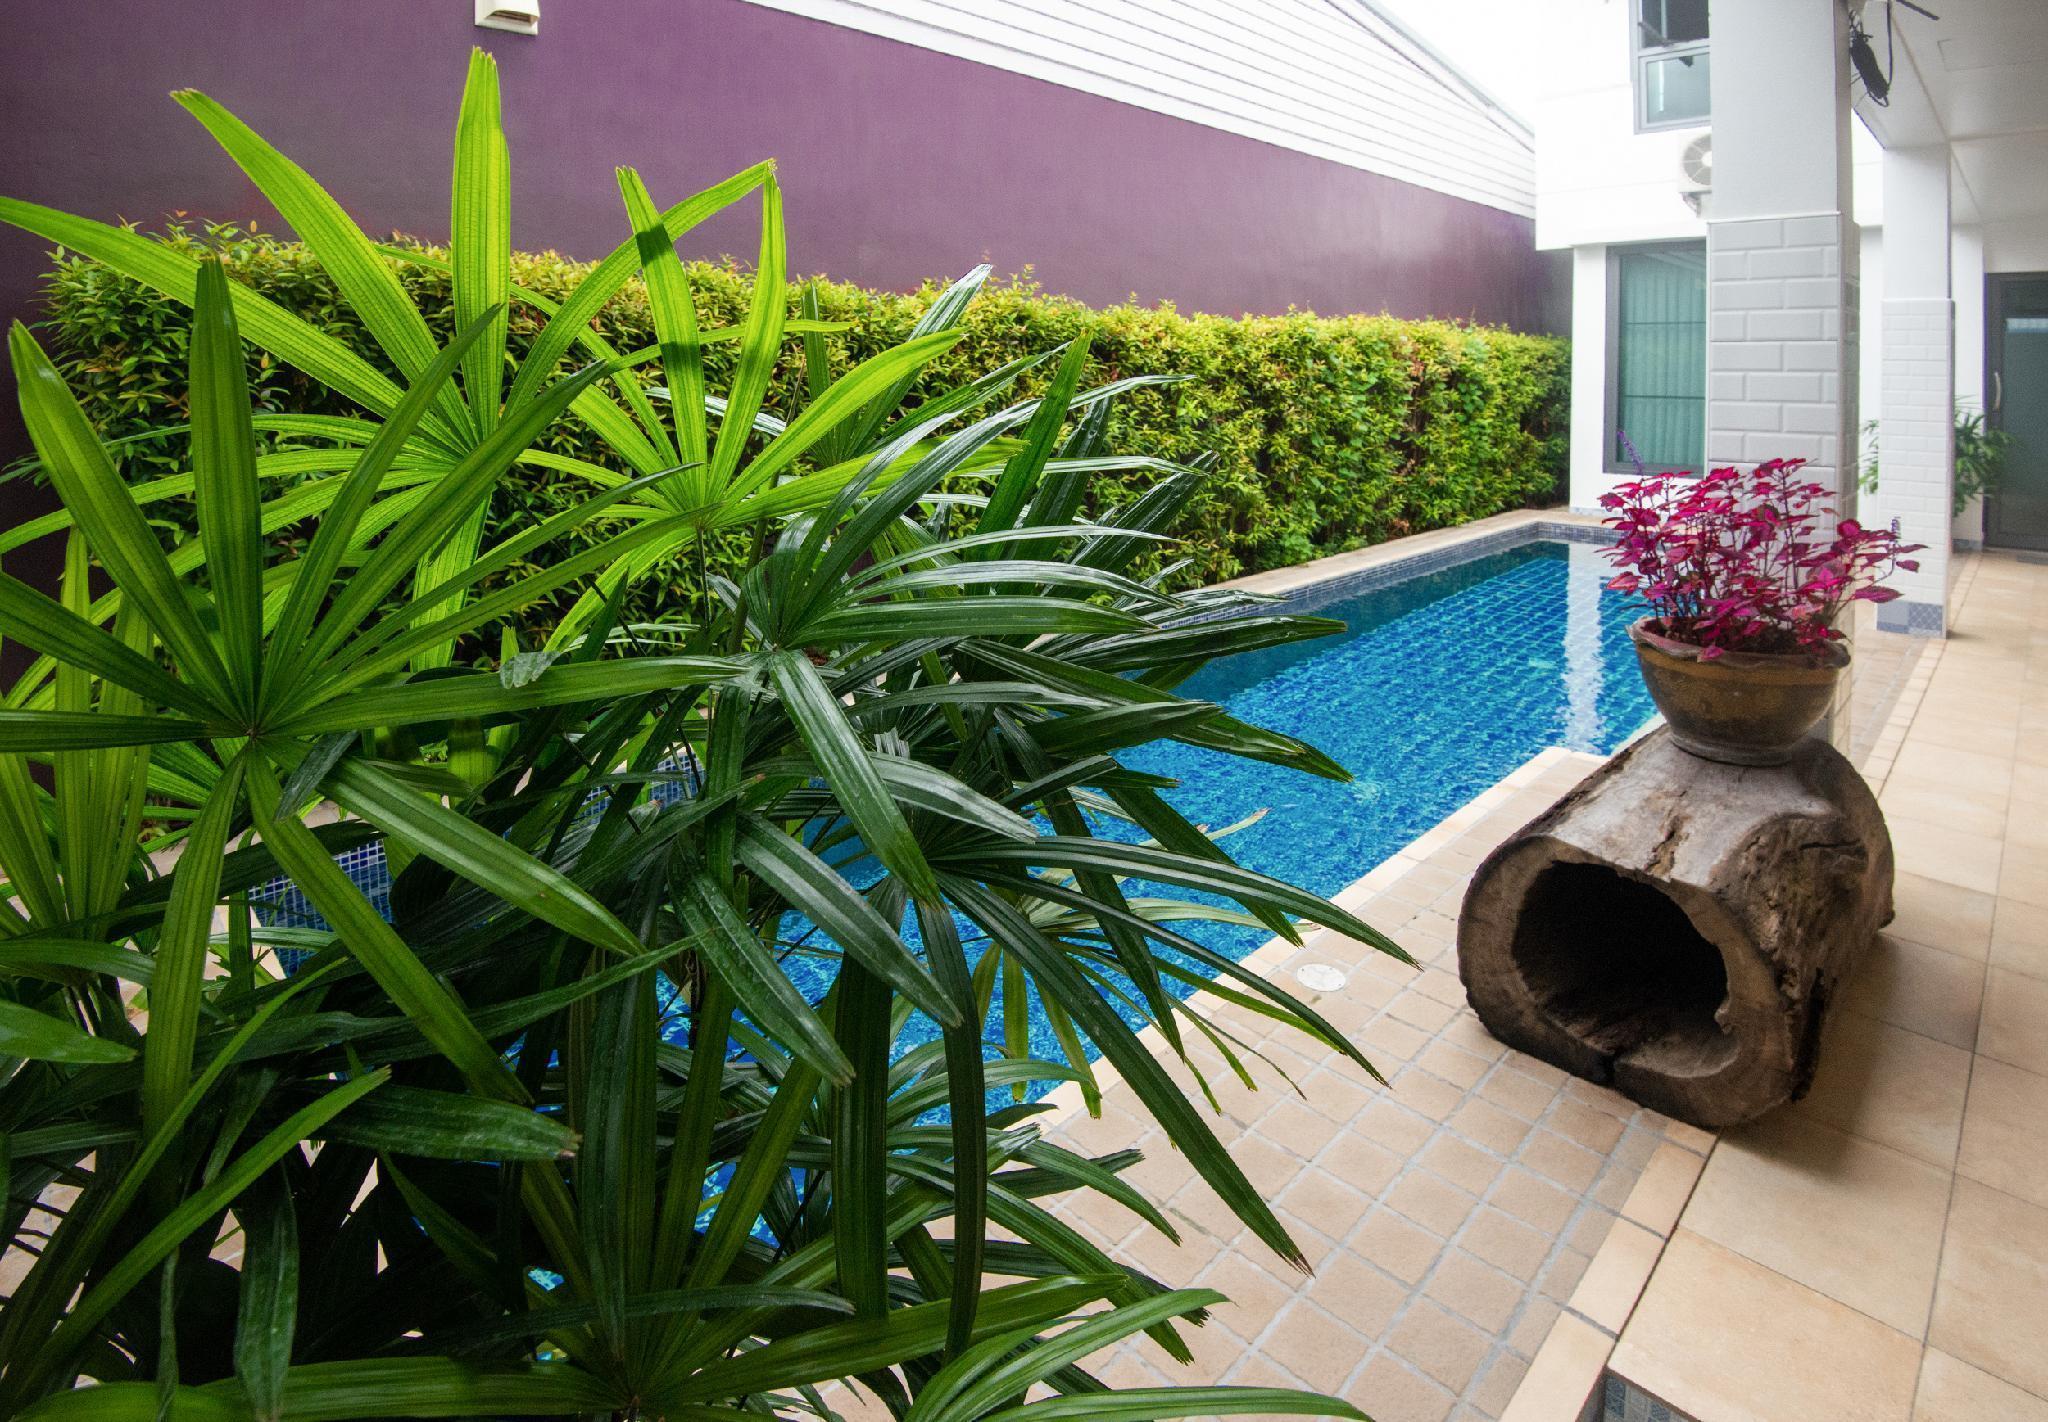 Billina Boutique Villa private pool two bedroom 2 ห้องนอน 3 ห้องน้ำส่วนตัว ขนาด 450 ตร.ม. – ฉลอง